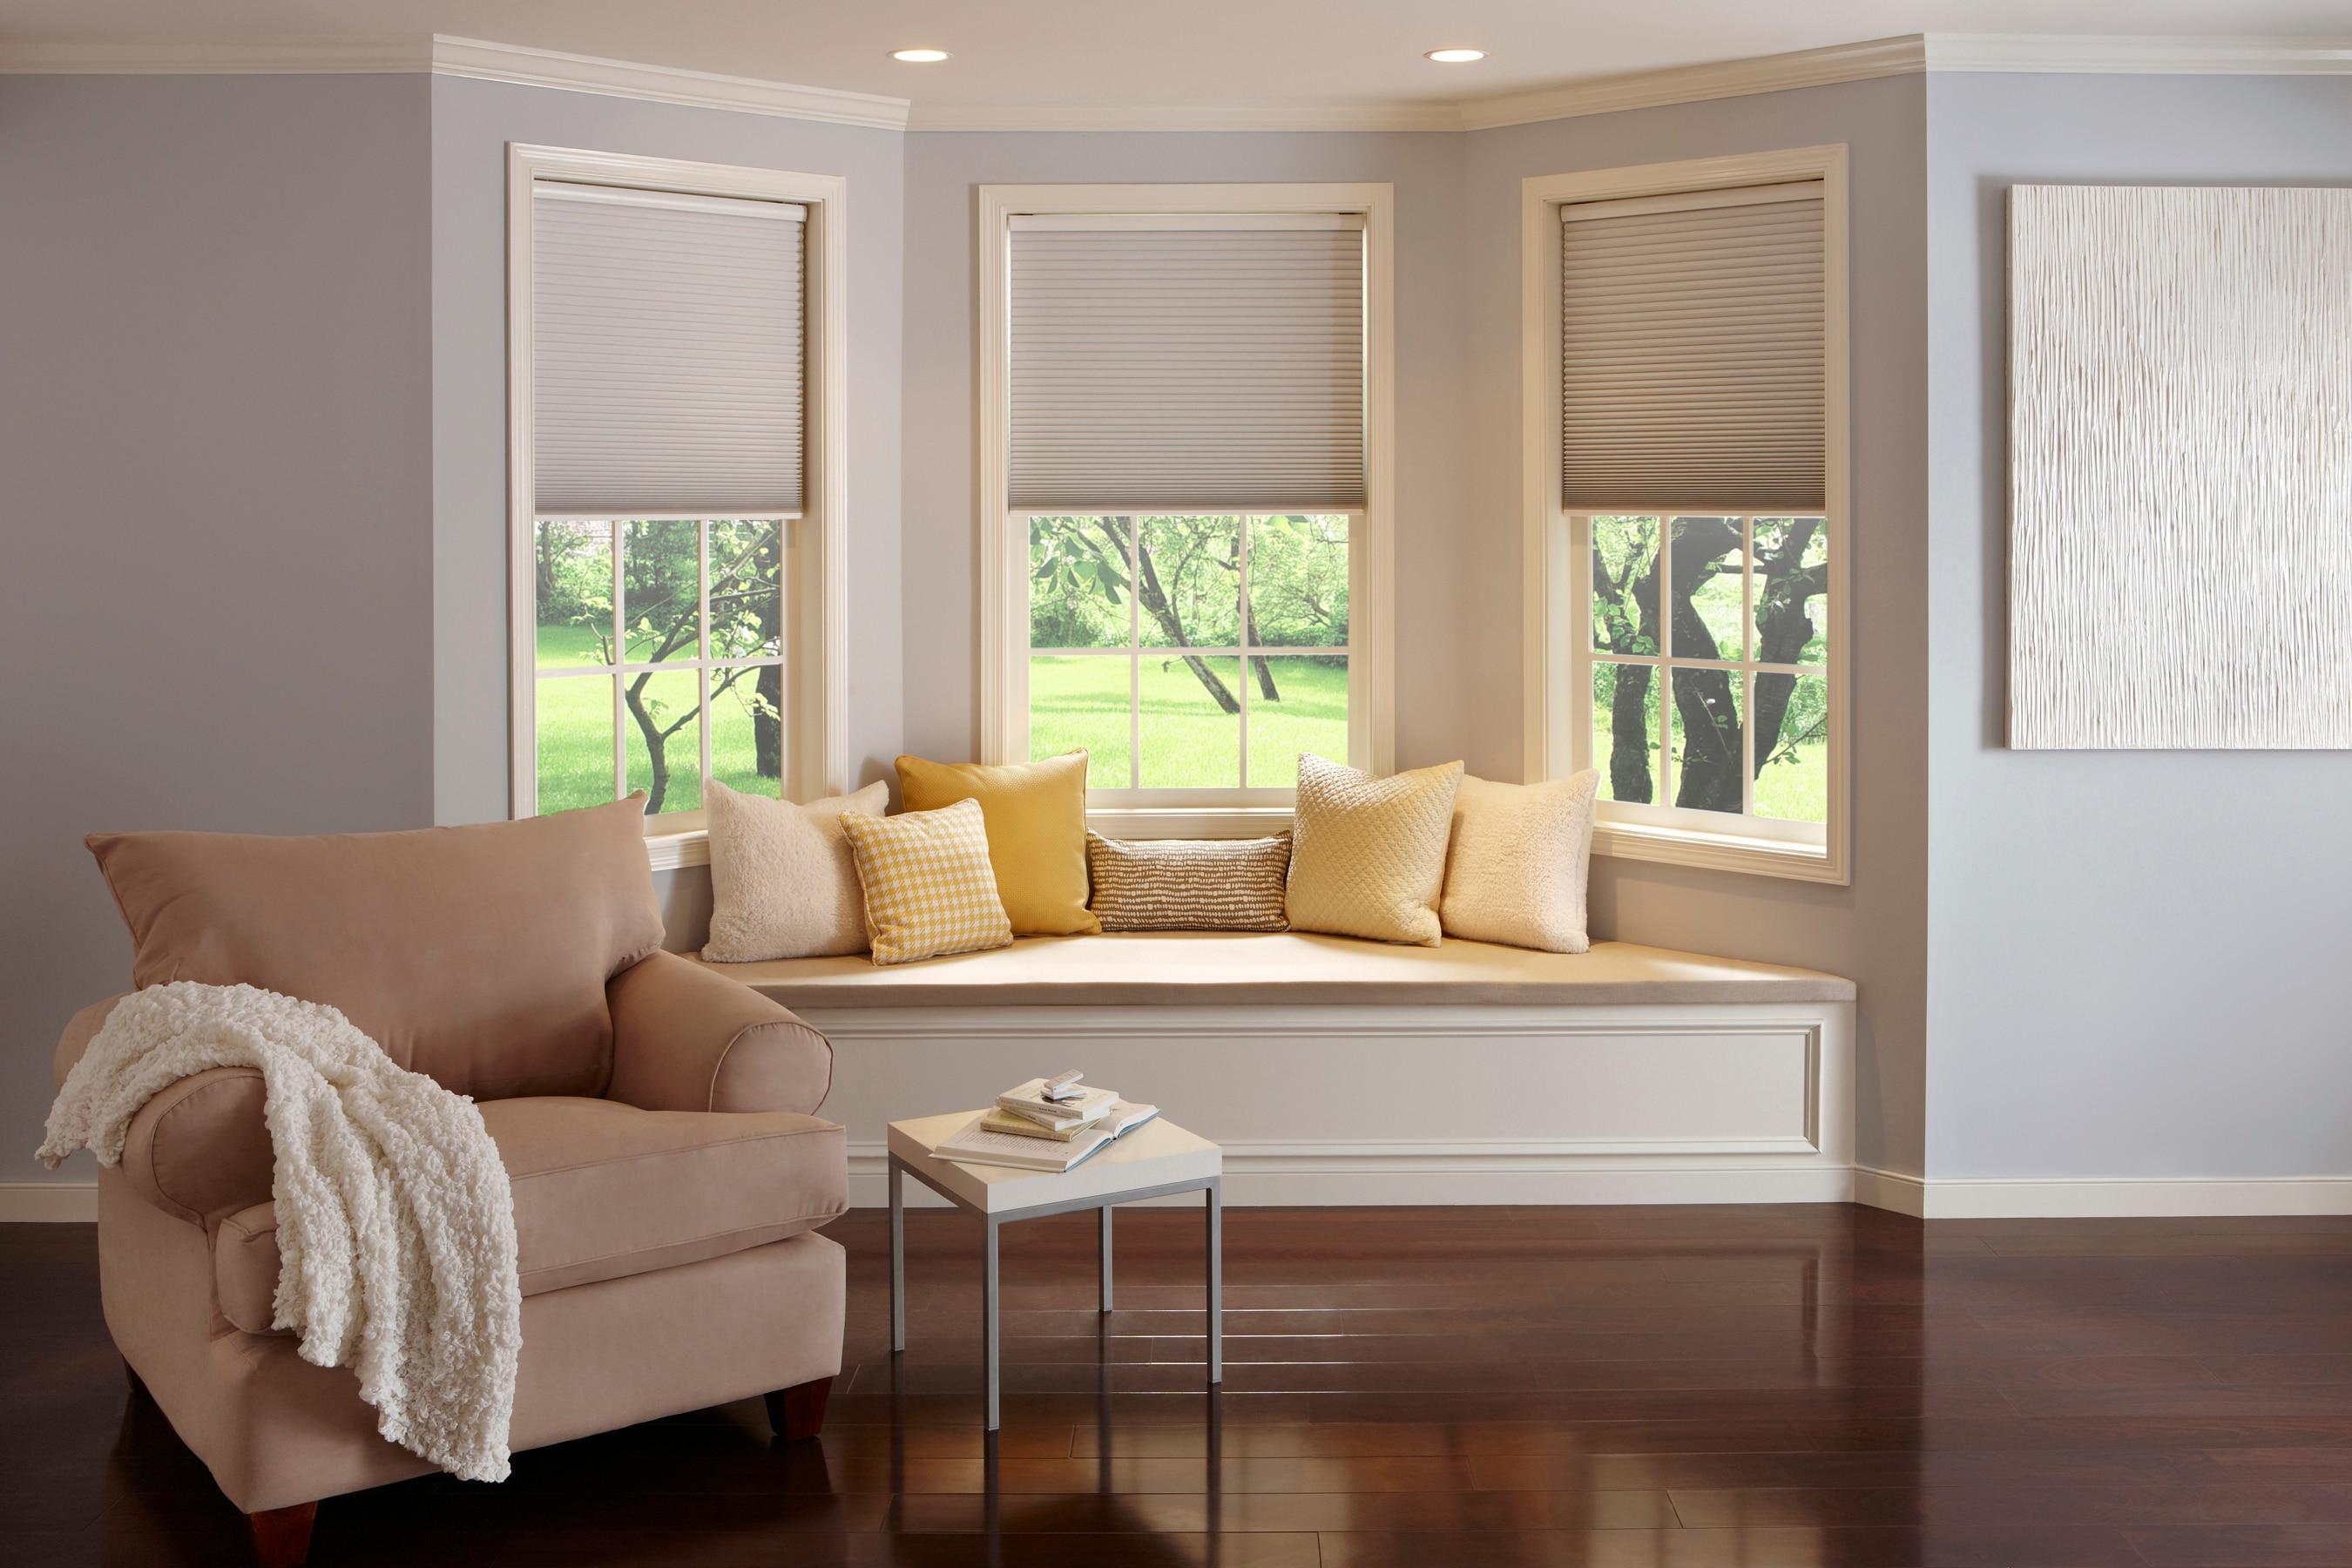 shades a look better install for wifi decorifusta blinds window decor motorized